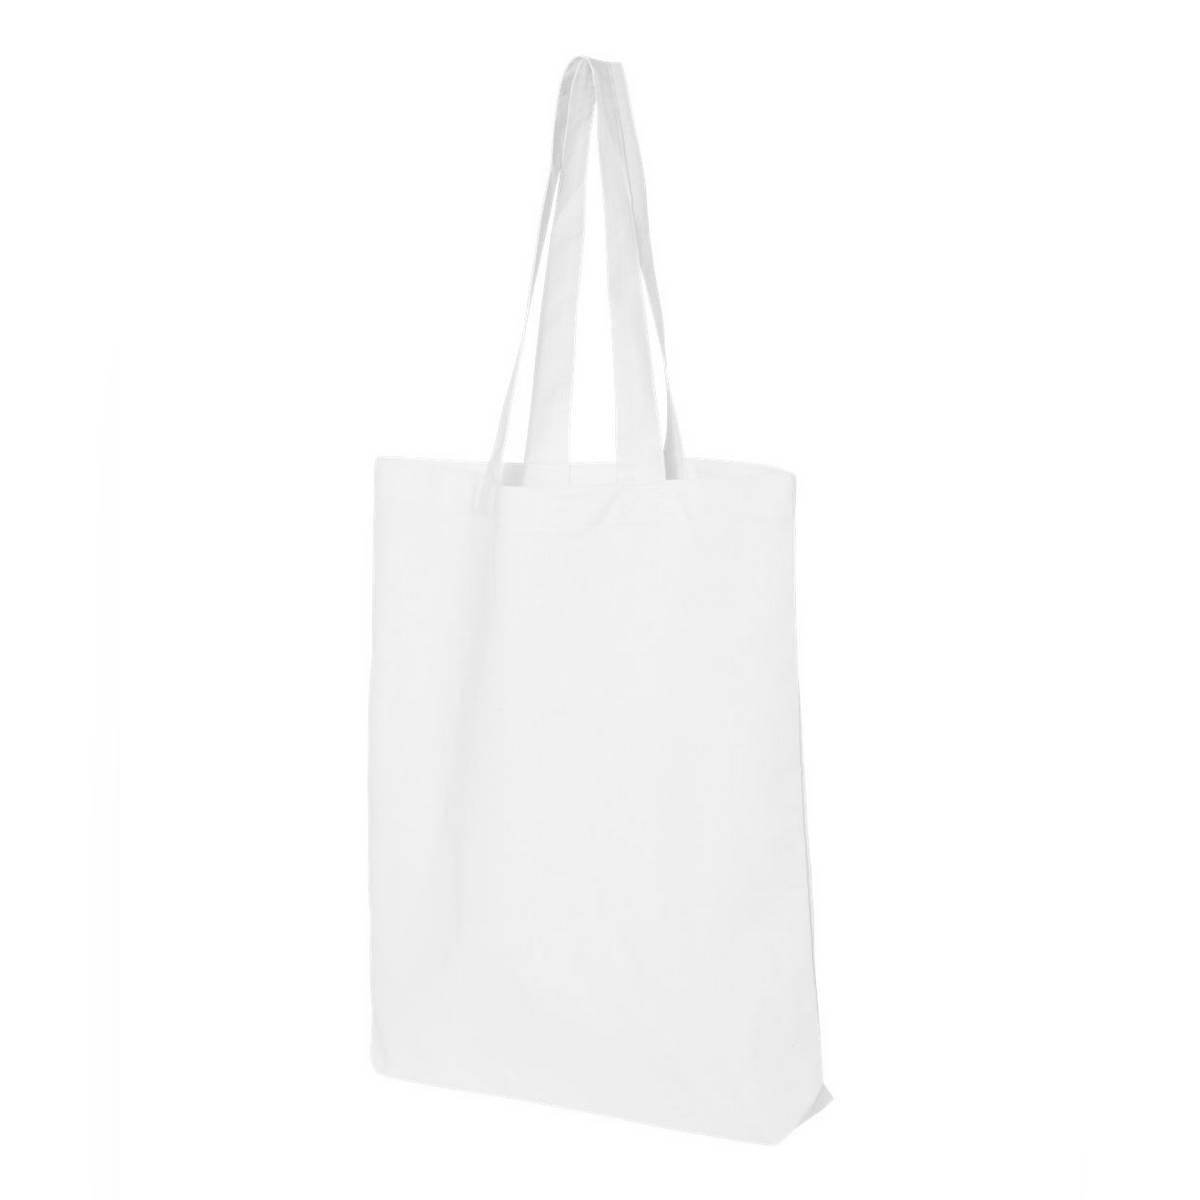 Plain Cotton Maxi Large Wide Shoulder Tote Shopper Grocery Shopping Bag - Natural